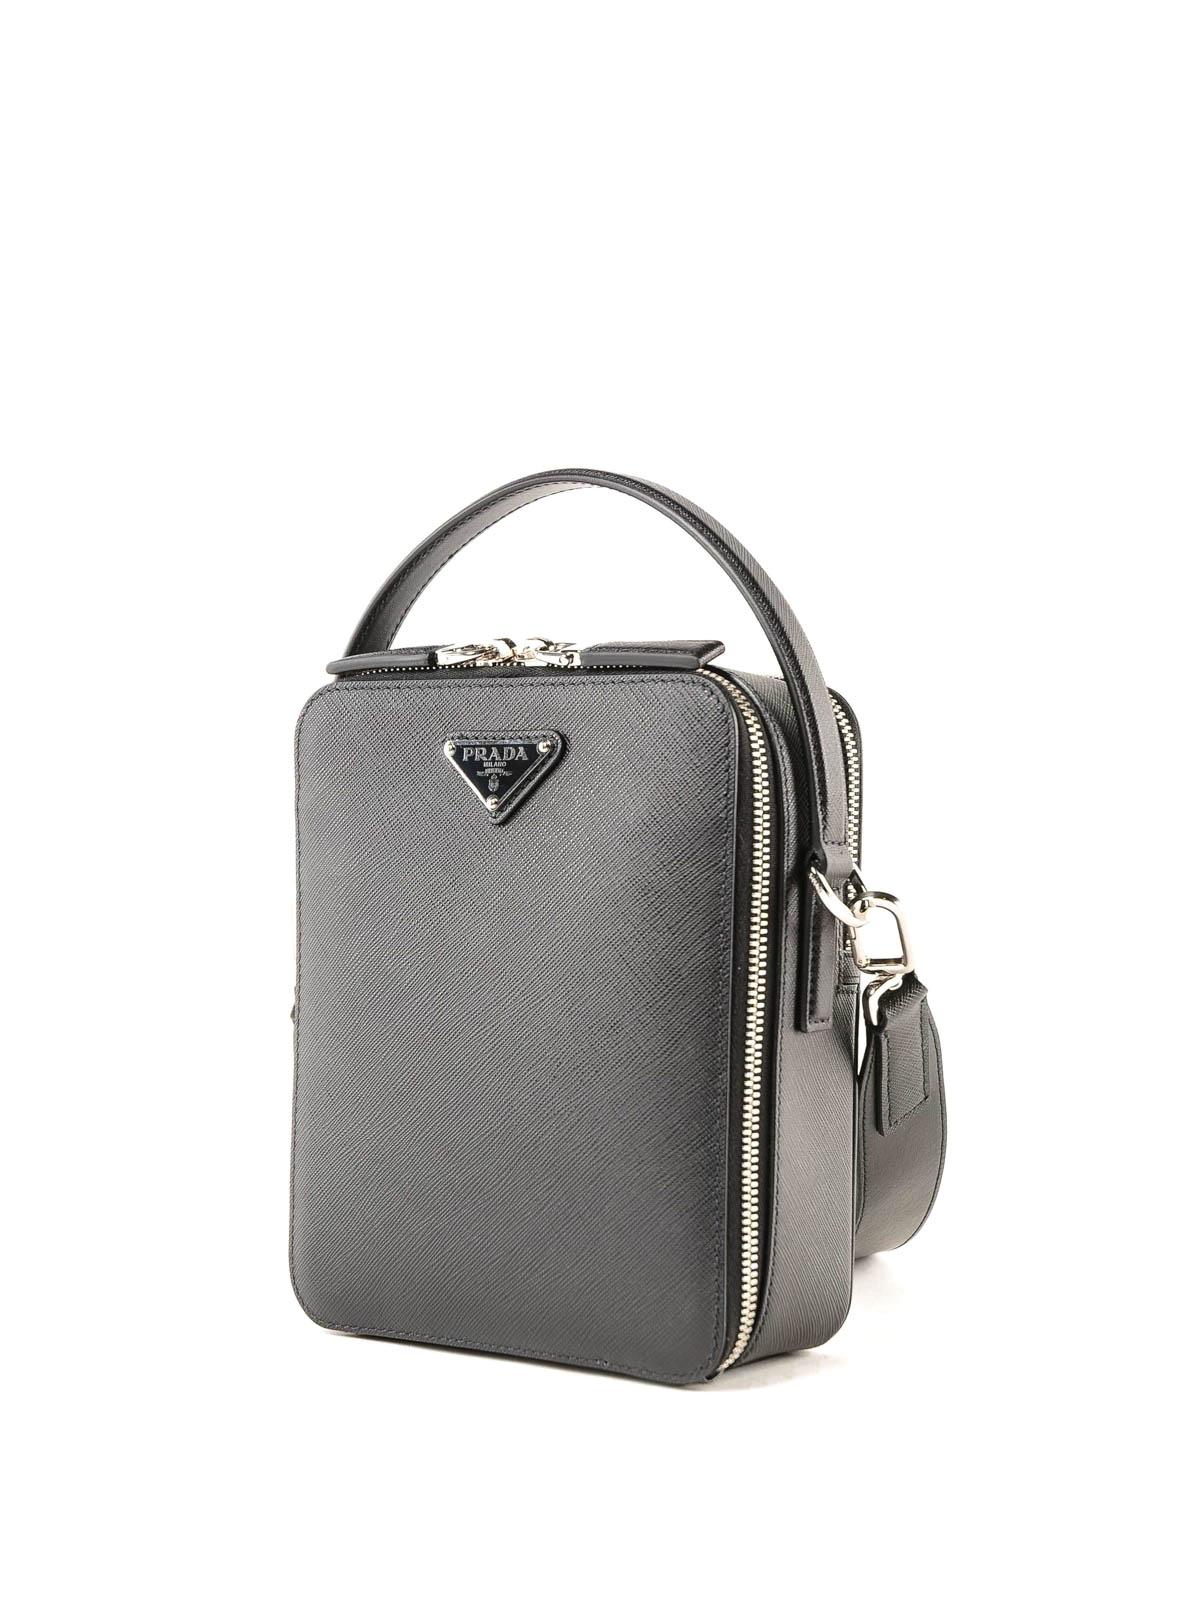 ffb823eea67d PRADA  cross body bags online - Black saffiano leather crossbody bag